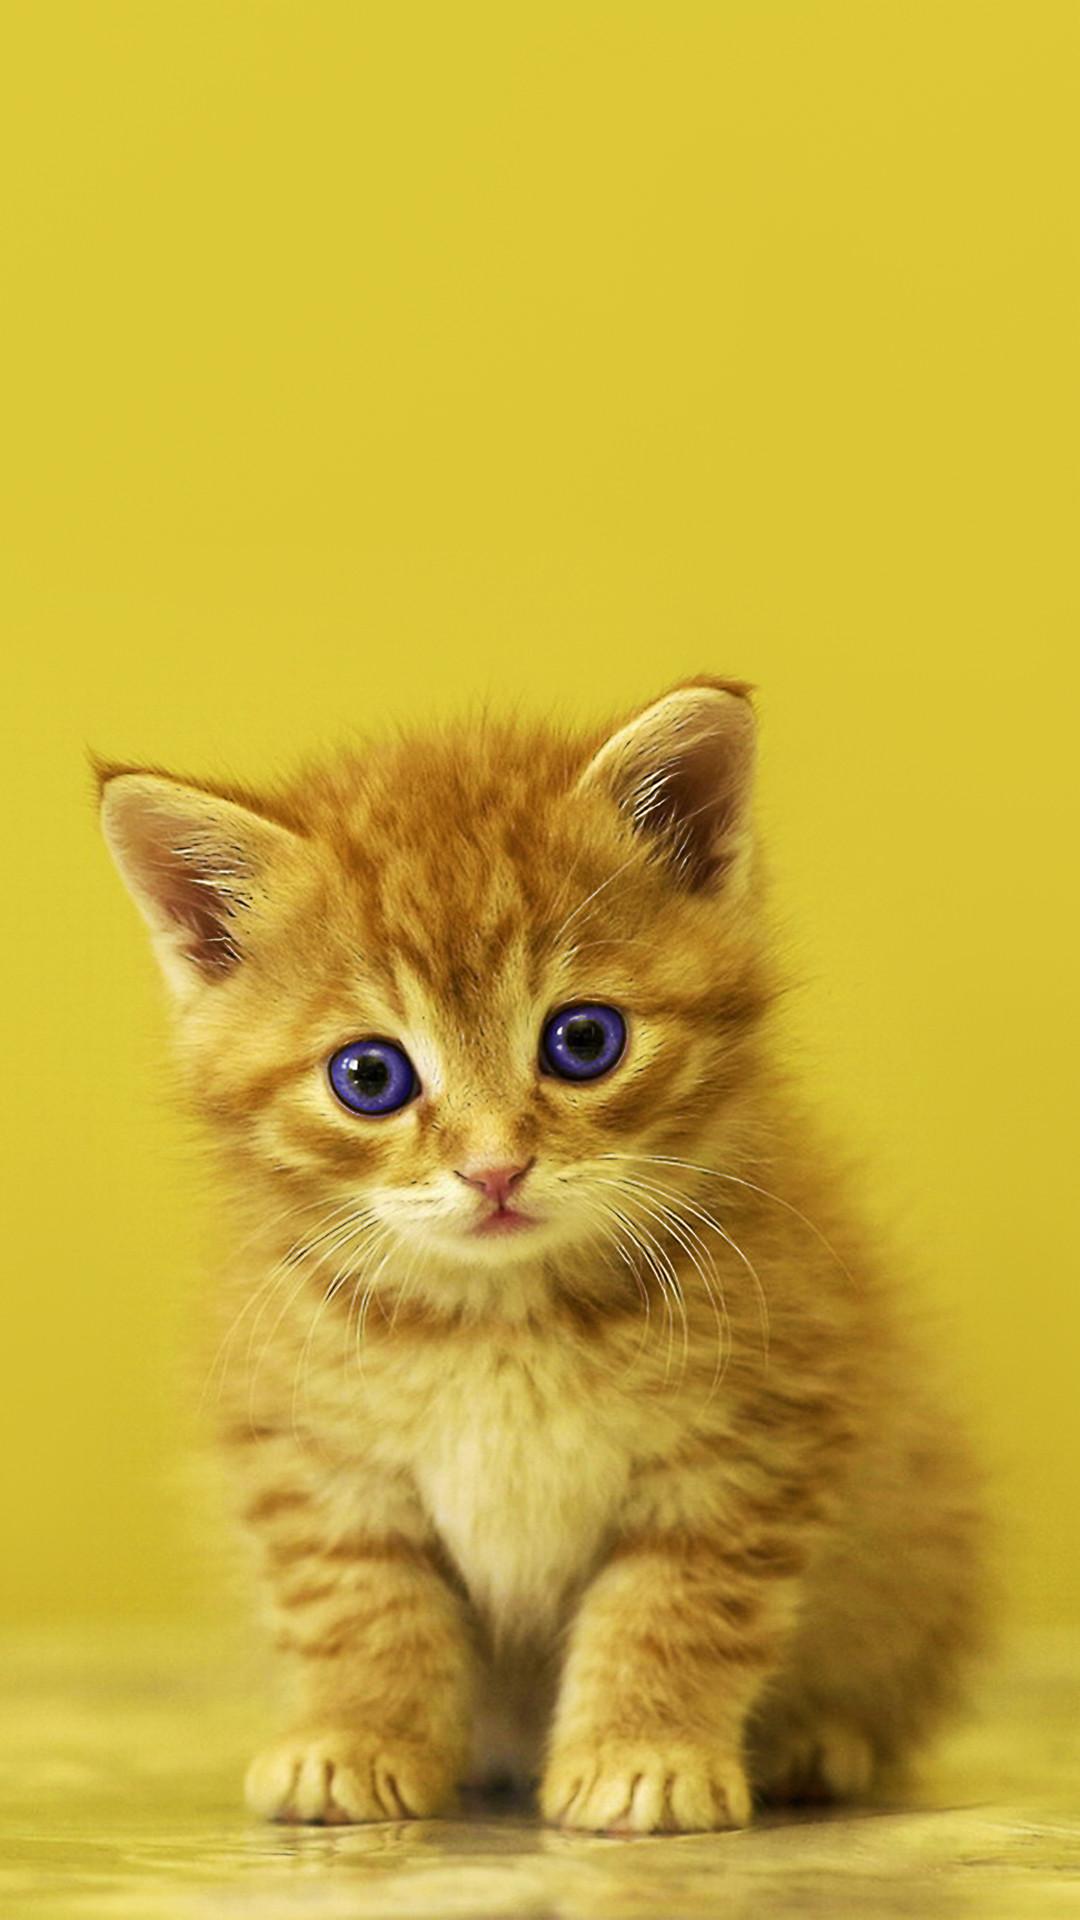 Res: 1080x1920, Baby Kitten Phone Wallpaper